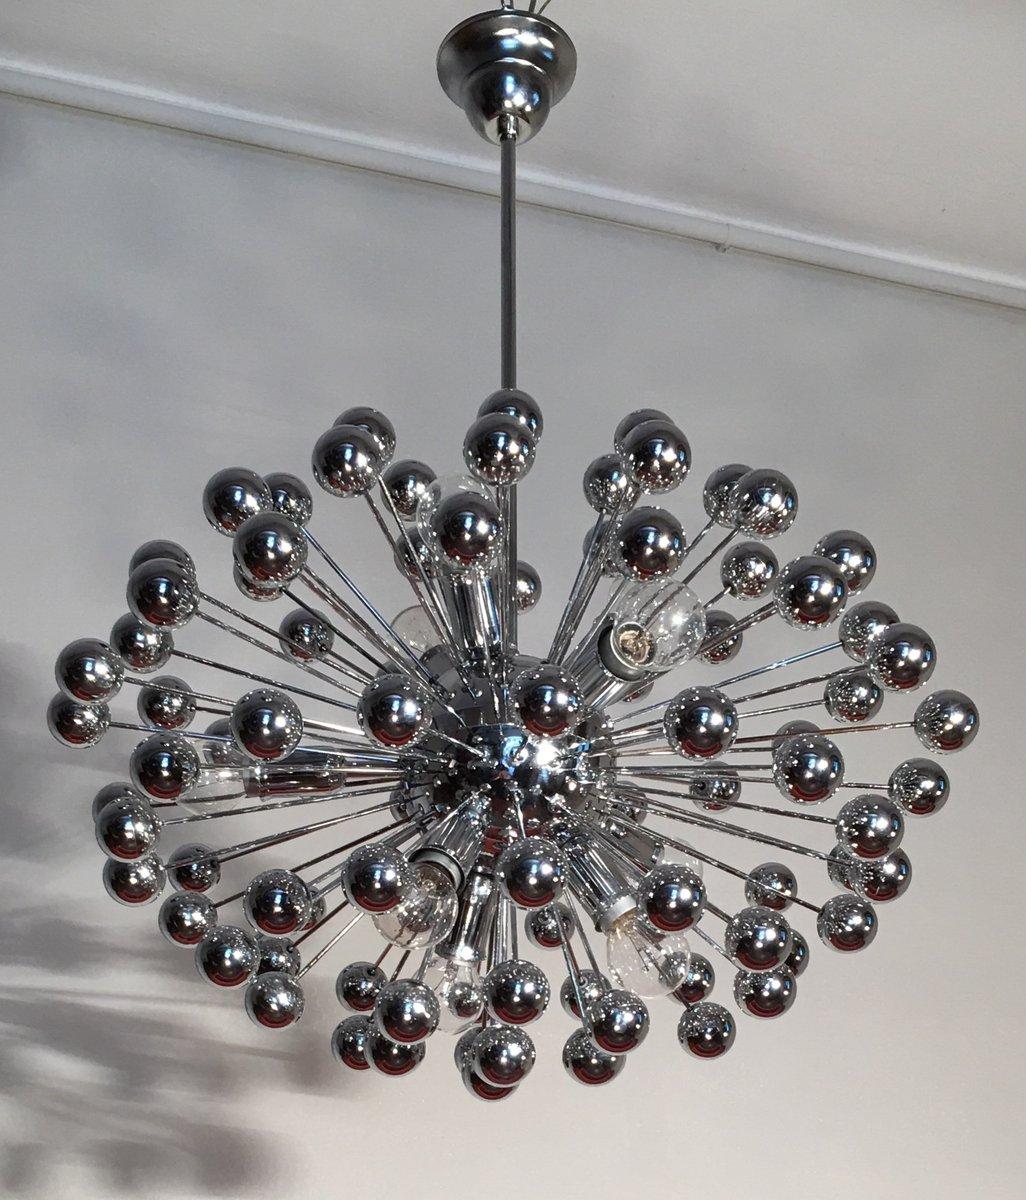 Italienischer Mid-Century Chrom Sputnik Kronleuchter, 1960er